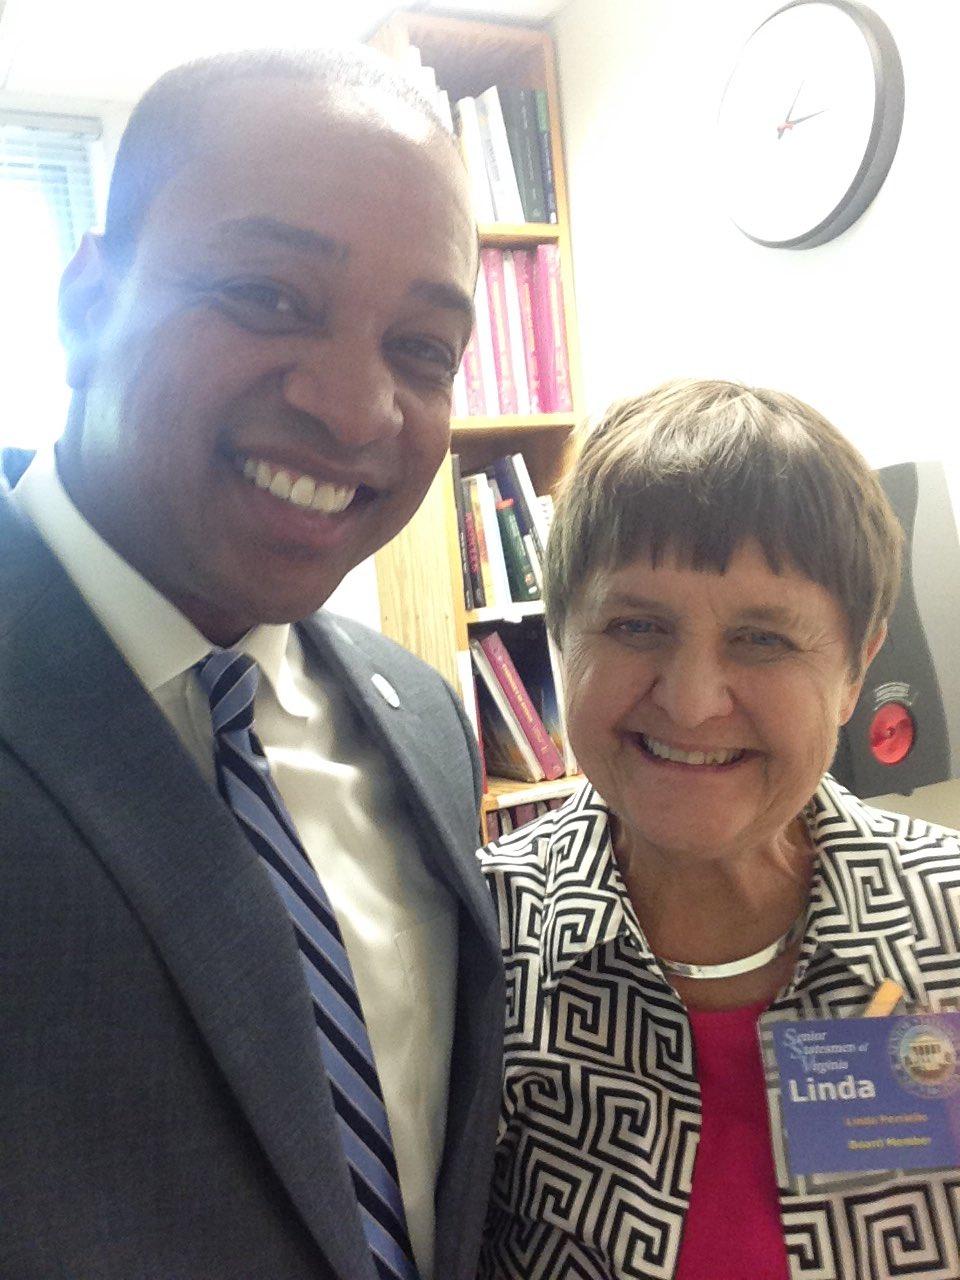 Mom declares @FairfaxJustin winner of today's LtGov debate! Follow lead of @lindaperriello and get involved! #WinVA https://t.co/xtlMF7iXzi